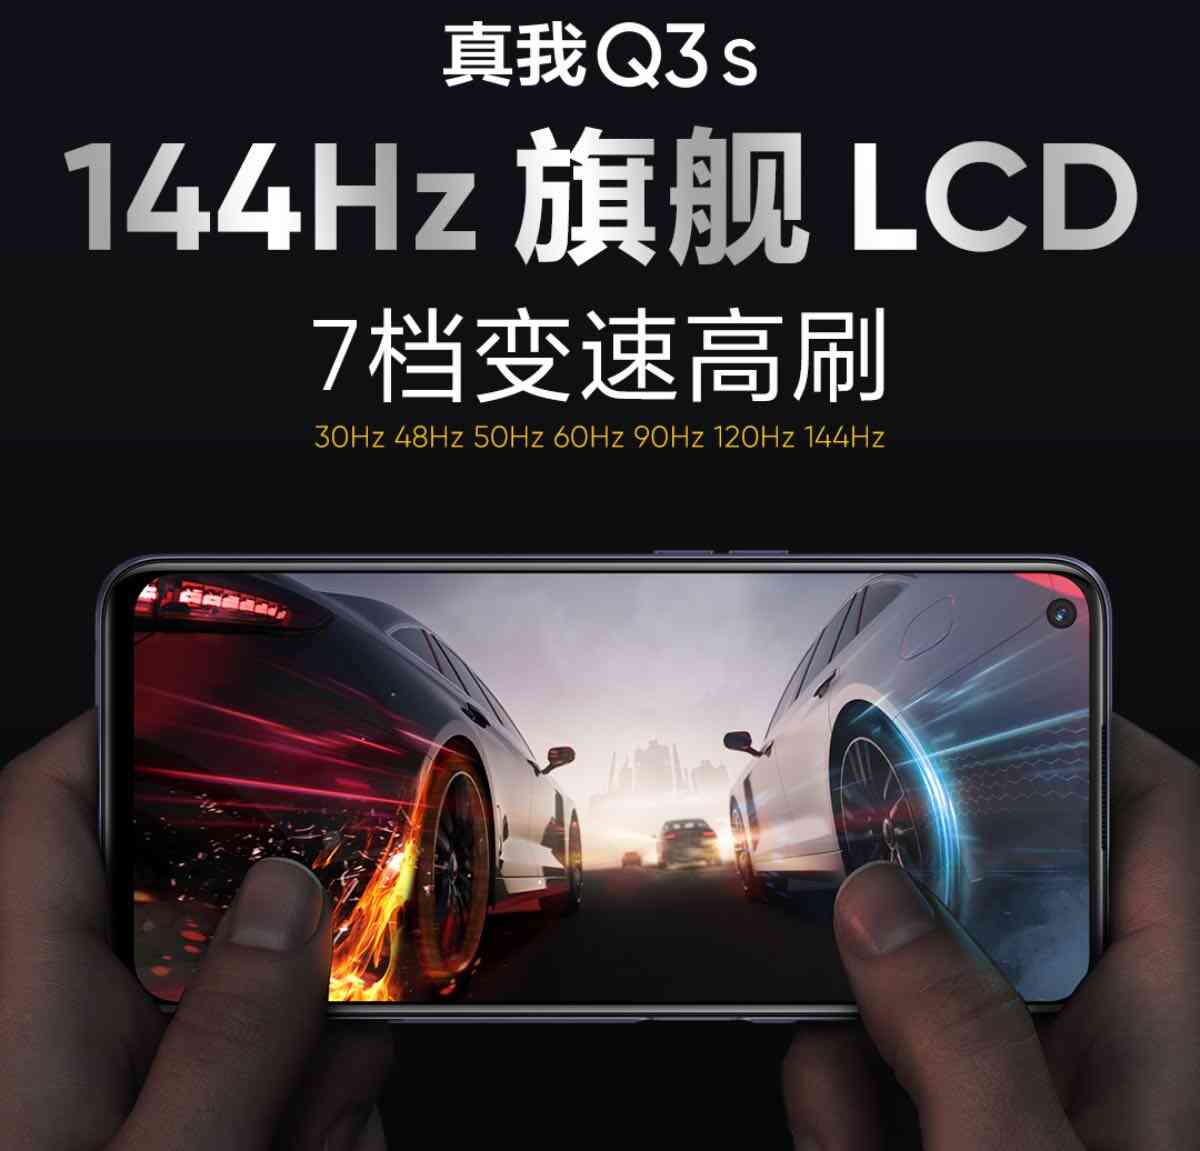 realme q3s display 15/10